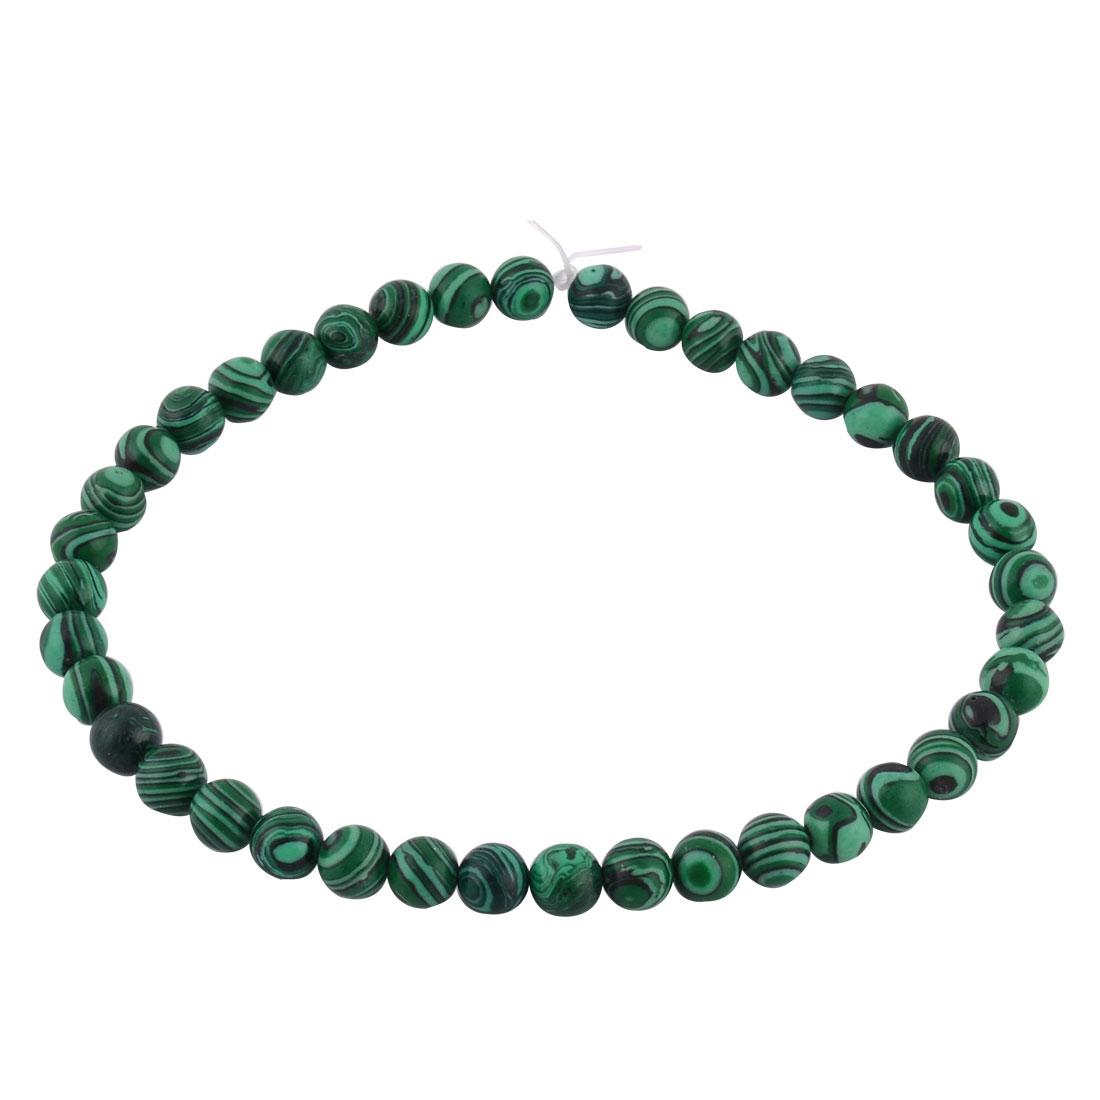 Malachite Grain Pattern DIY Beading Decor Necklace Bracelet Beads Strand 1cm Dia